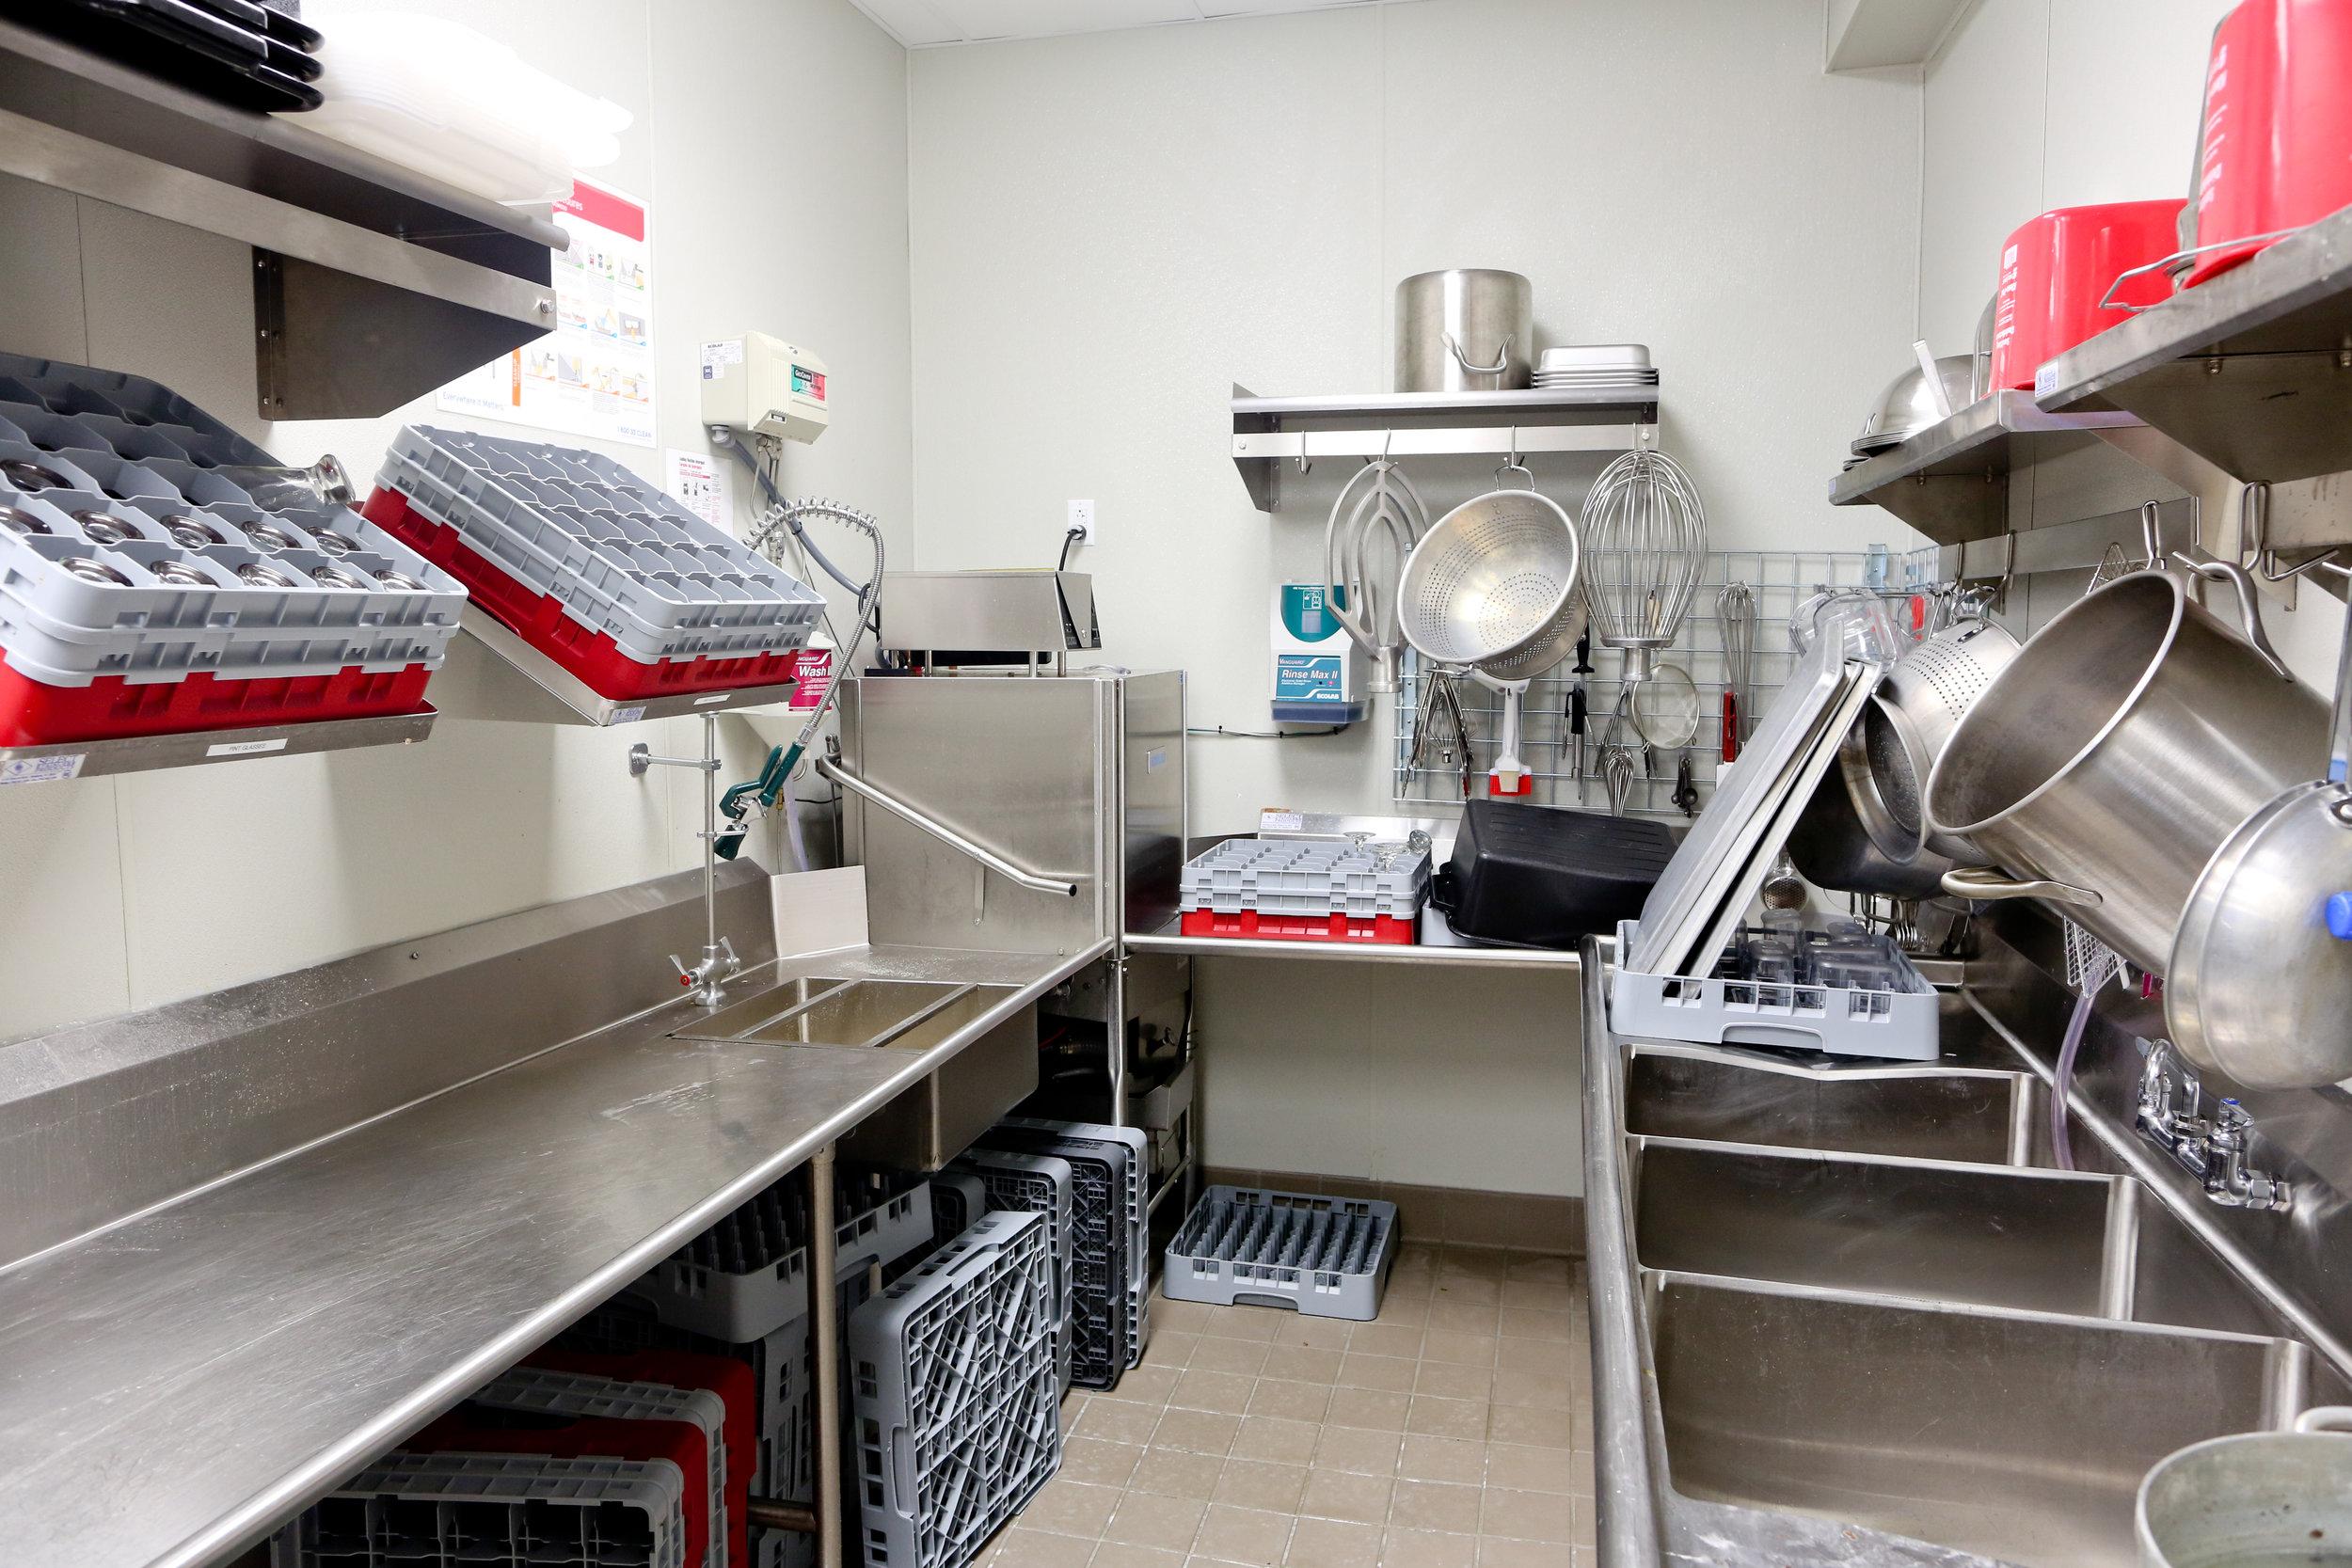 ADW-Restaurant-Brixx-Wood-Fired-Pizza-Cary-NC-Washroom.JPG